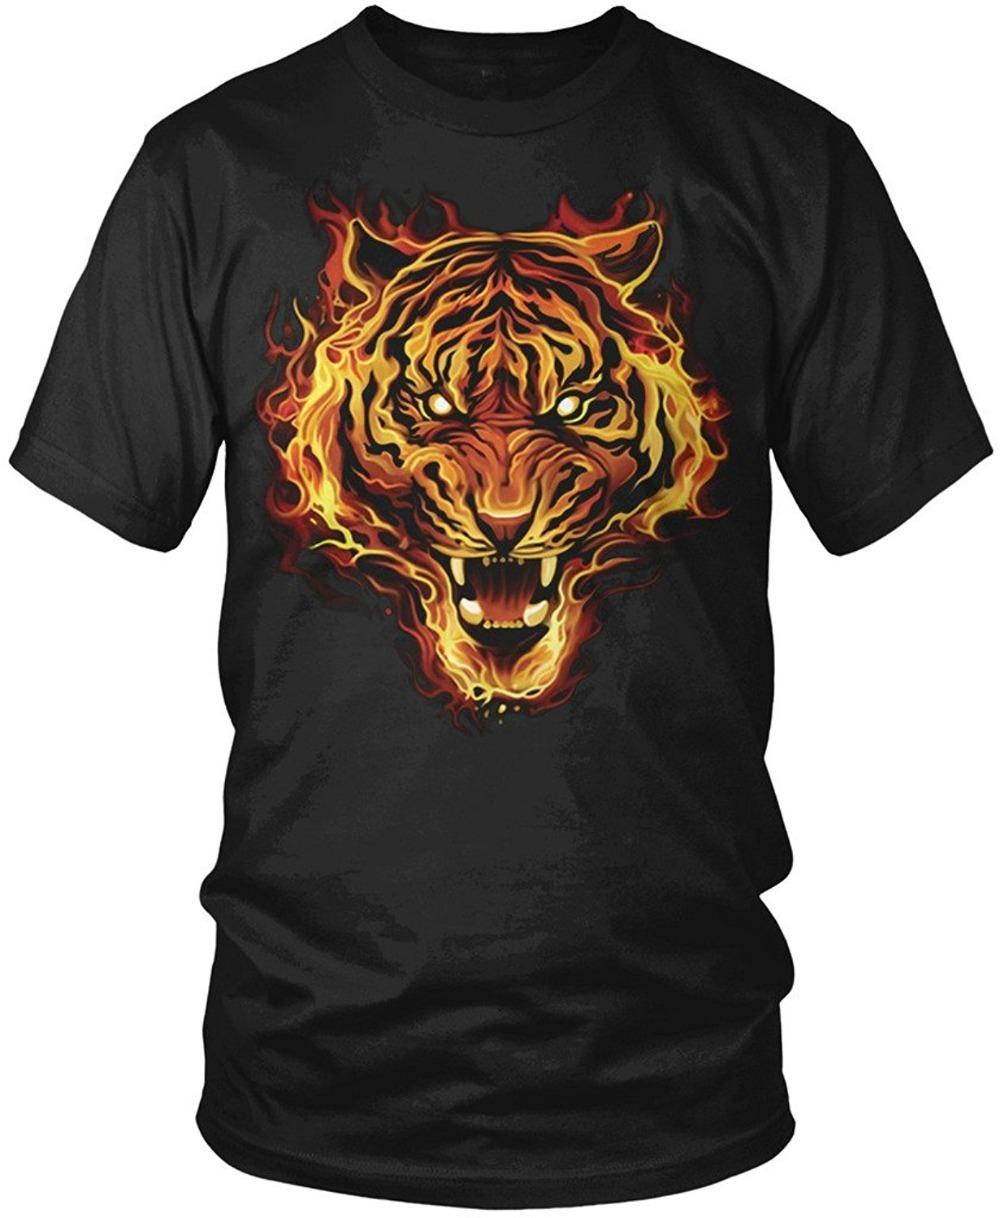 Get T Shirts Printed O Neck Graphic Short Sleeve Flaming Tiger Tiger